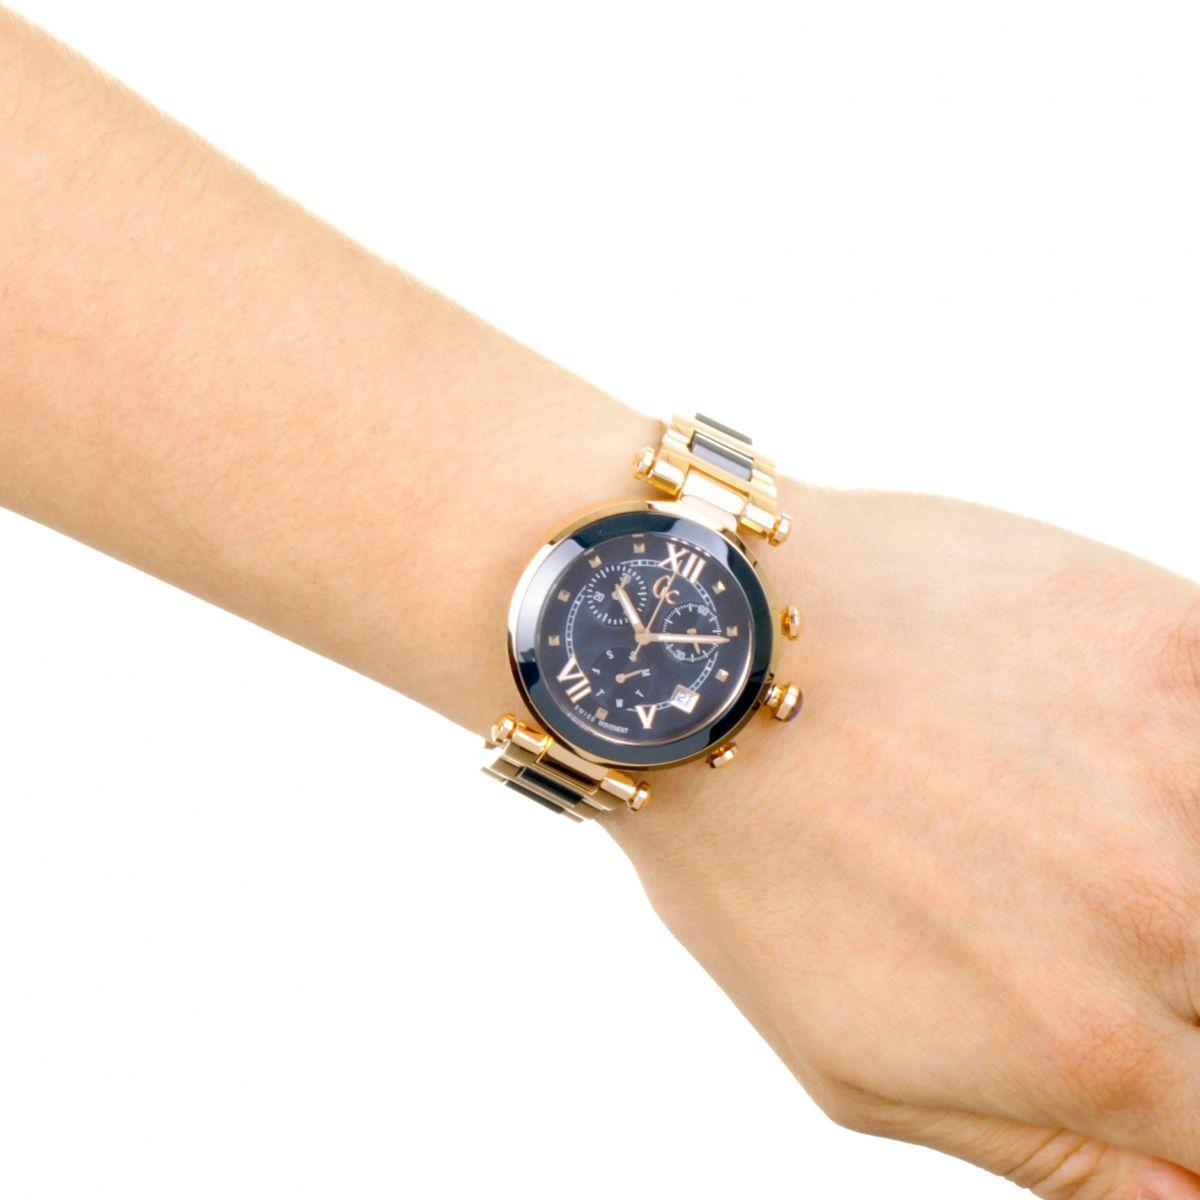 femme gc femme chic chronographe montre y05009m7. Black Bedroom Furniture Sets. Home Design Ideas